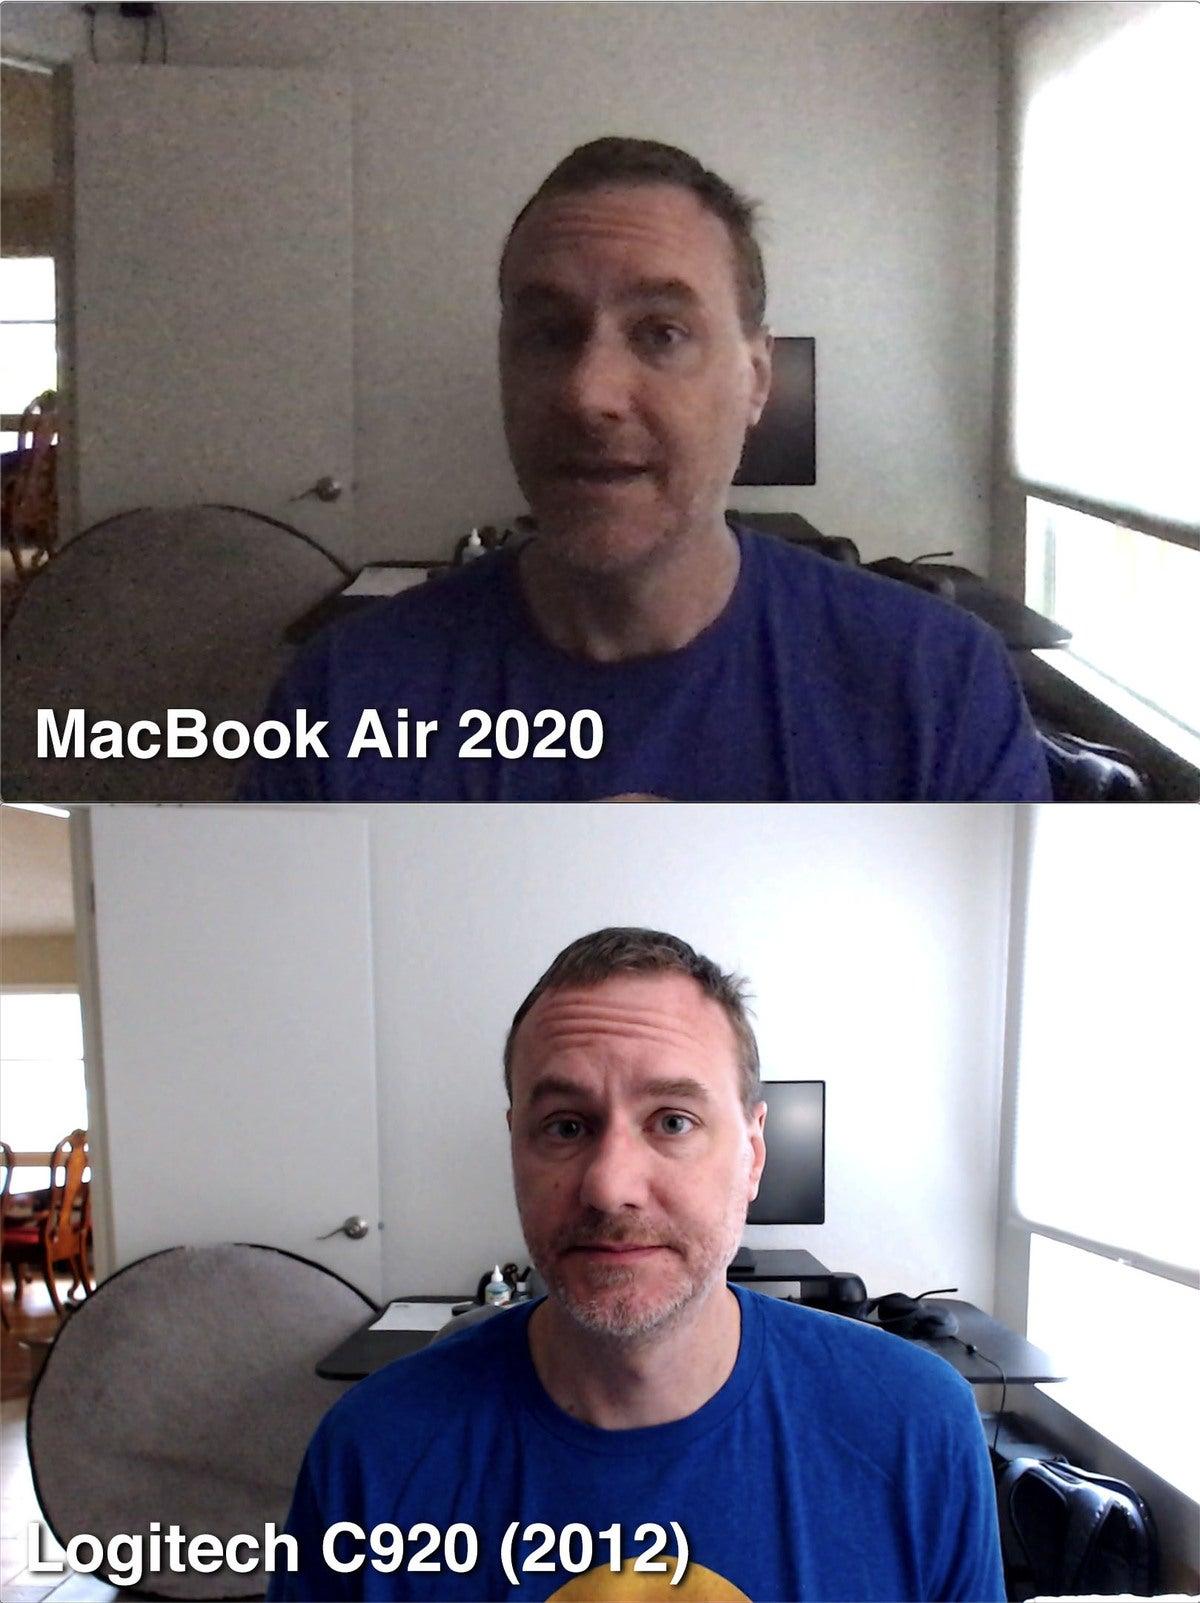 mb air 2020 webcam